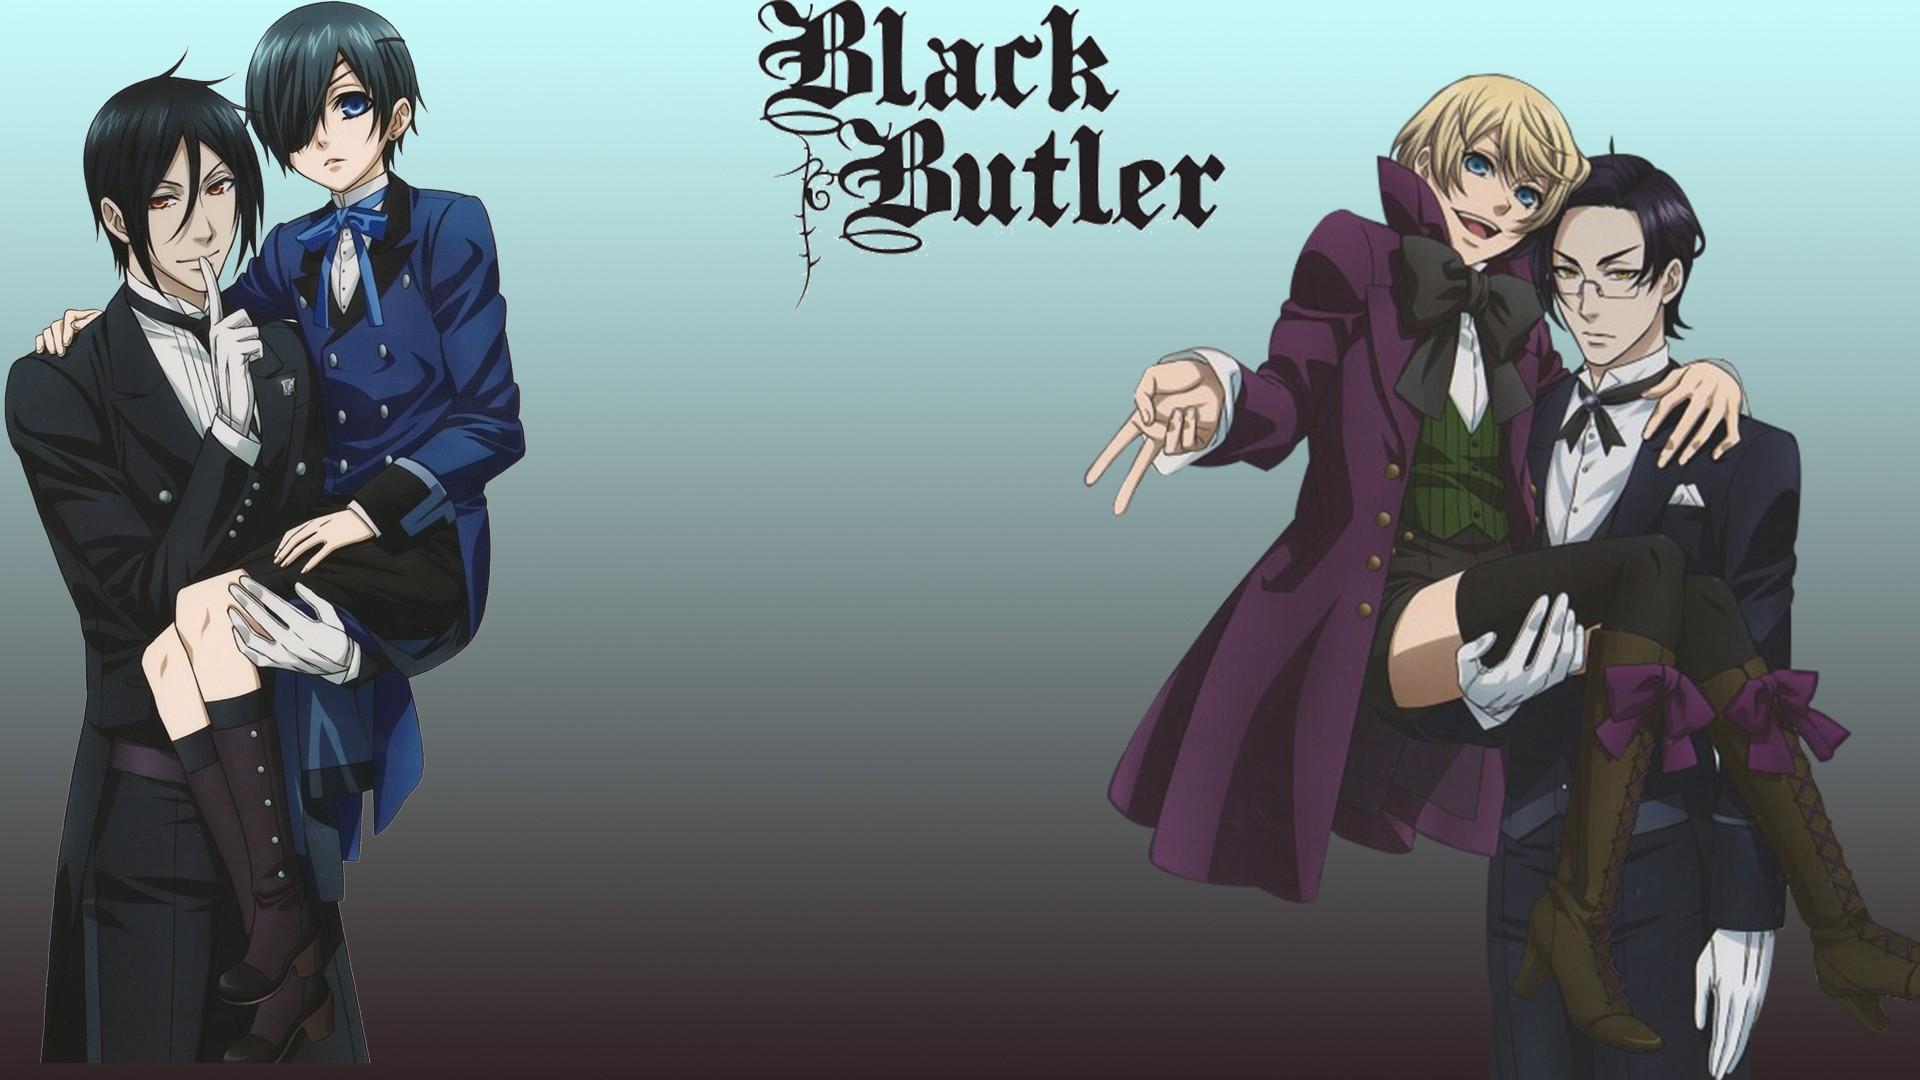 Black Butler wallpaper ·① Download free amazing ...